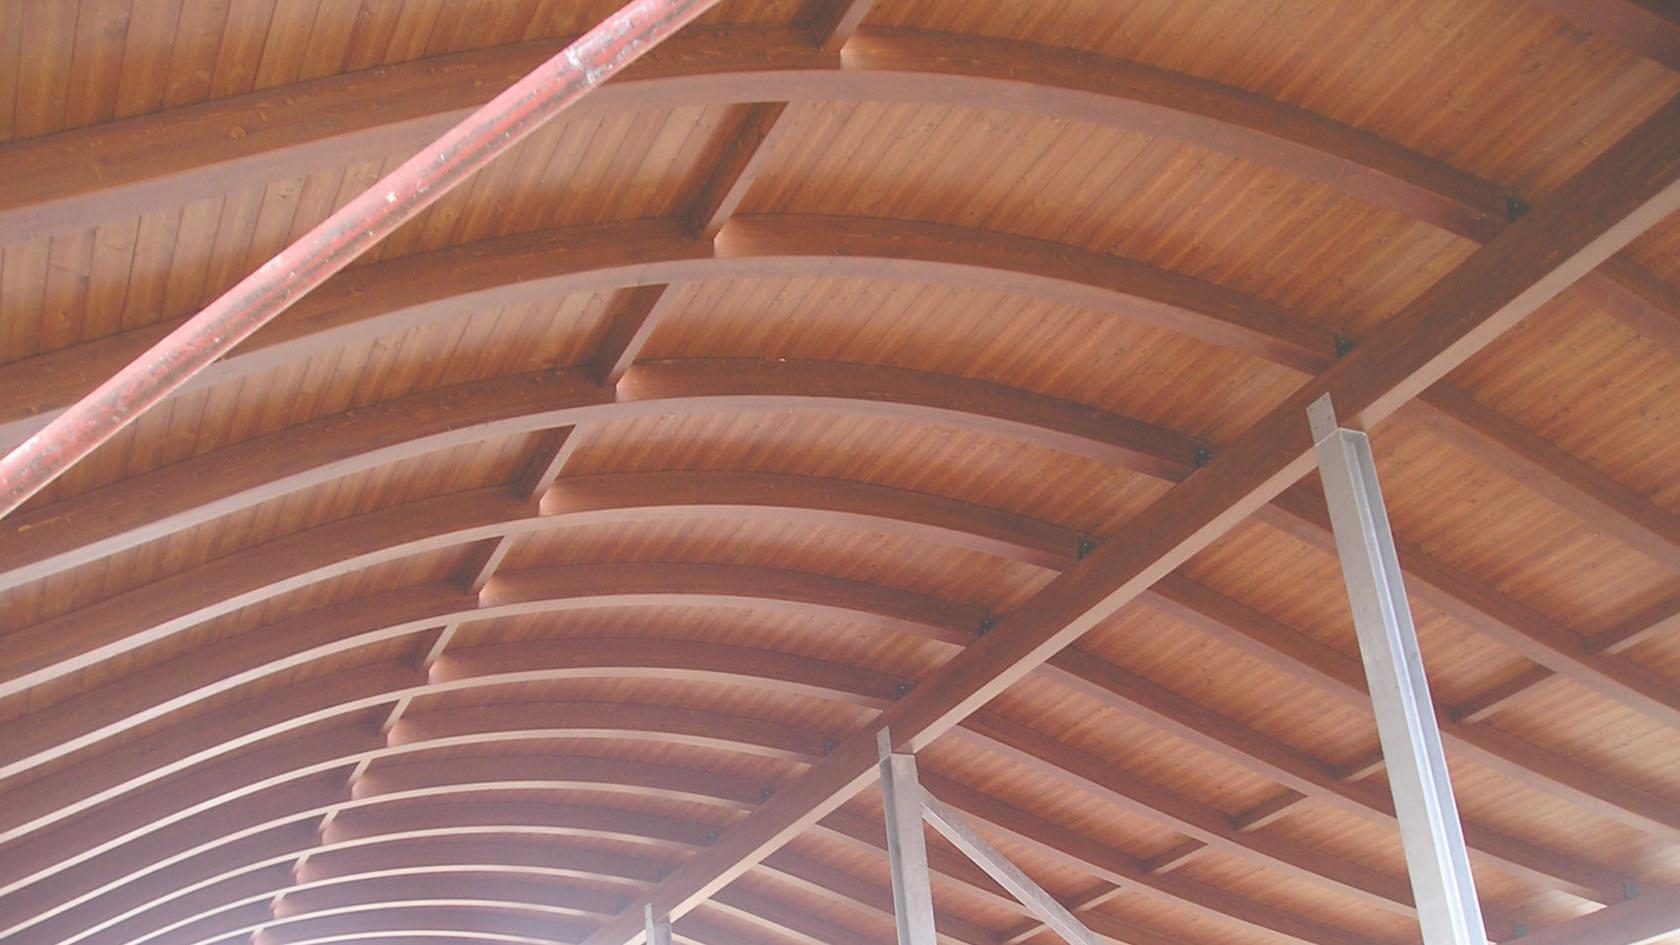 Strutture prefabbricate in legno - Mariotti Prefabbricati